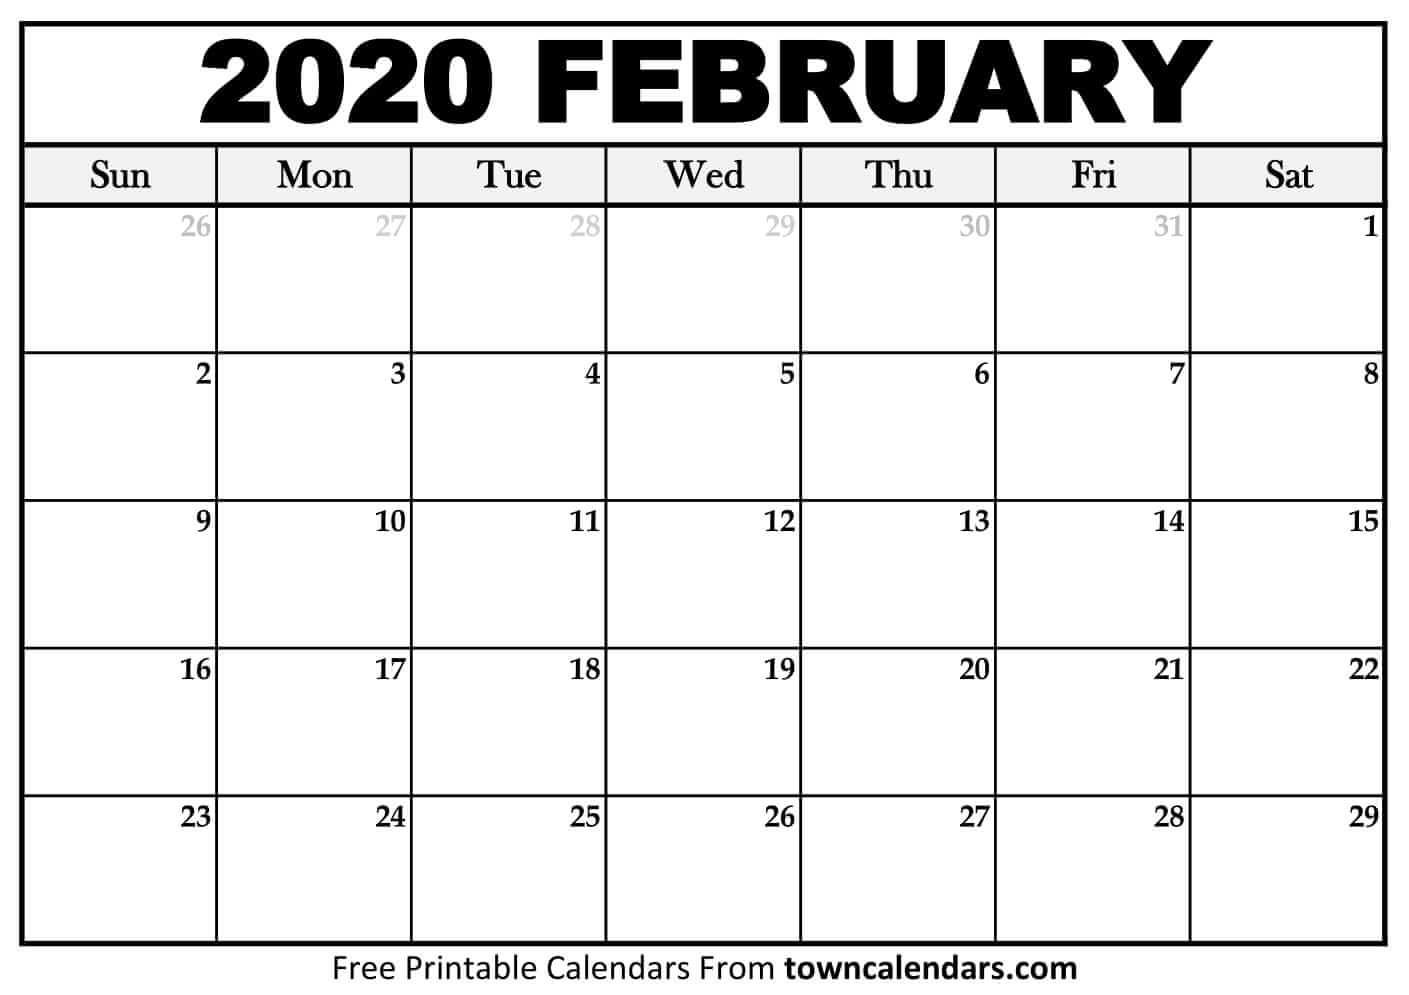 Printable February 2020 Calendar - Towncalendars  February 2020 Calendar